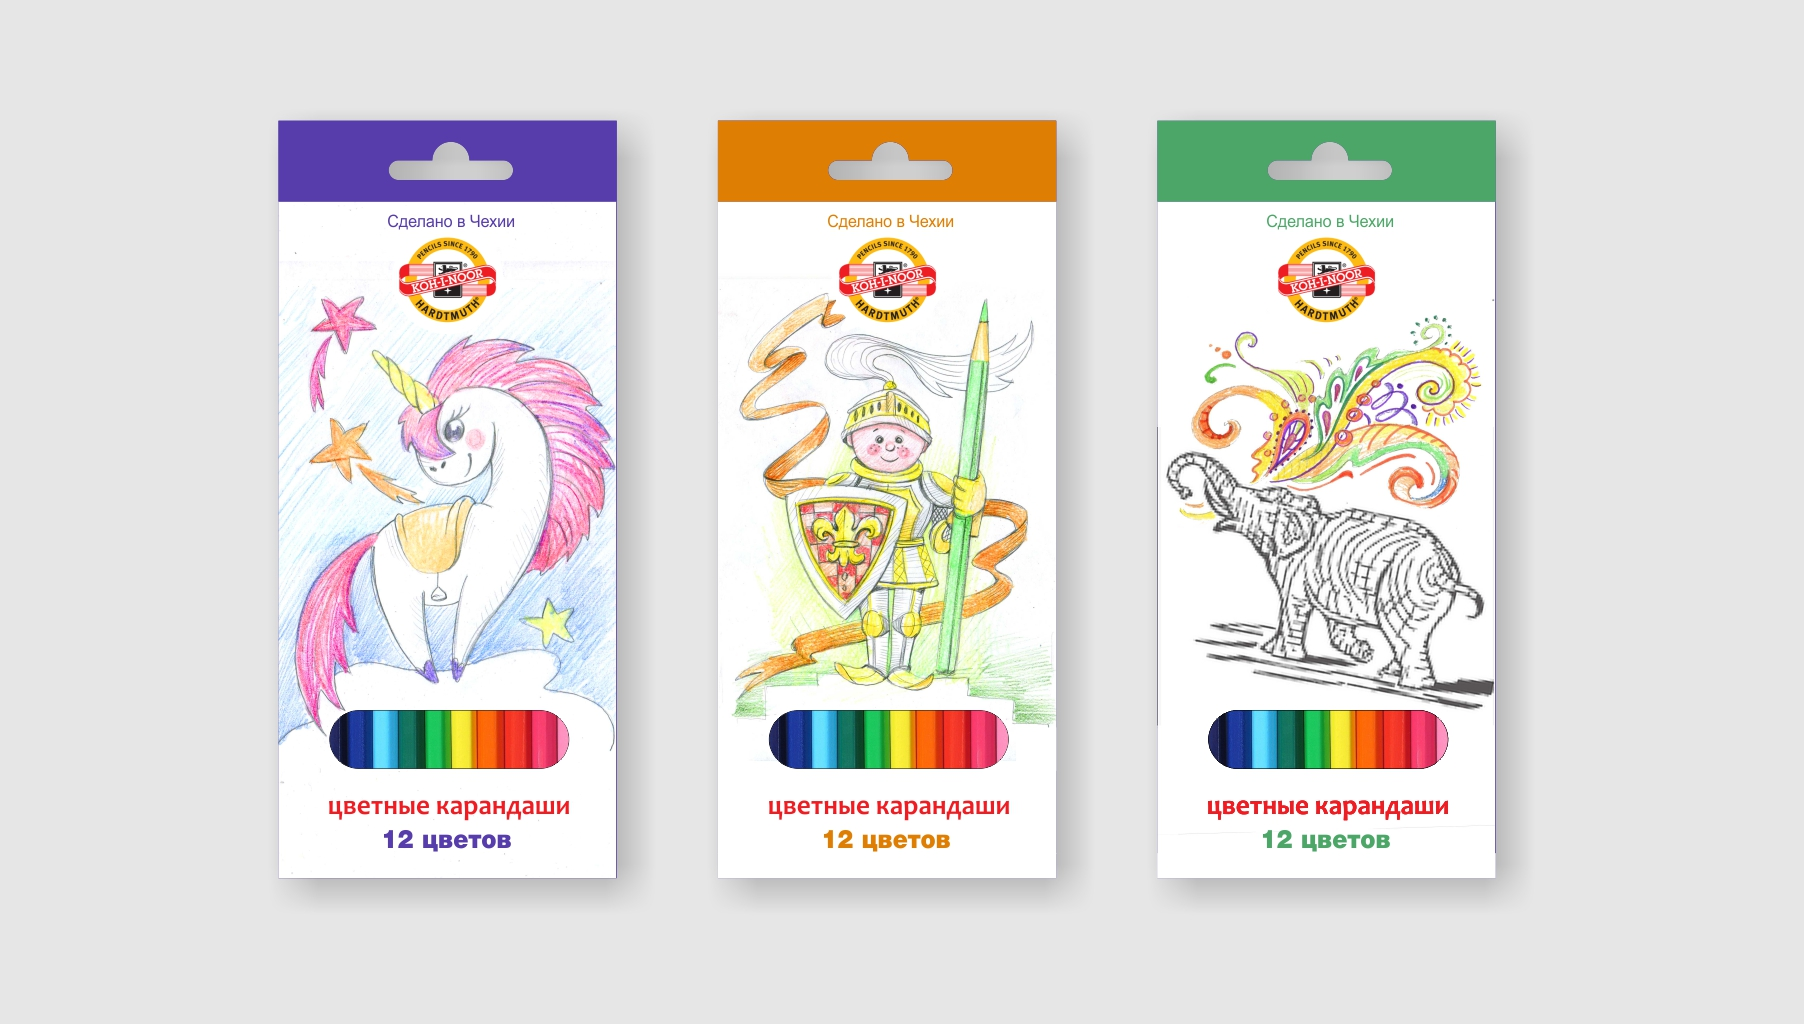 Разработка дизайна упаковки для чешского бренда KOH-I-NOOR фото f_52159f070bc297f9.jpg